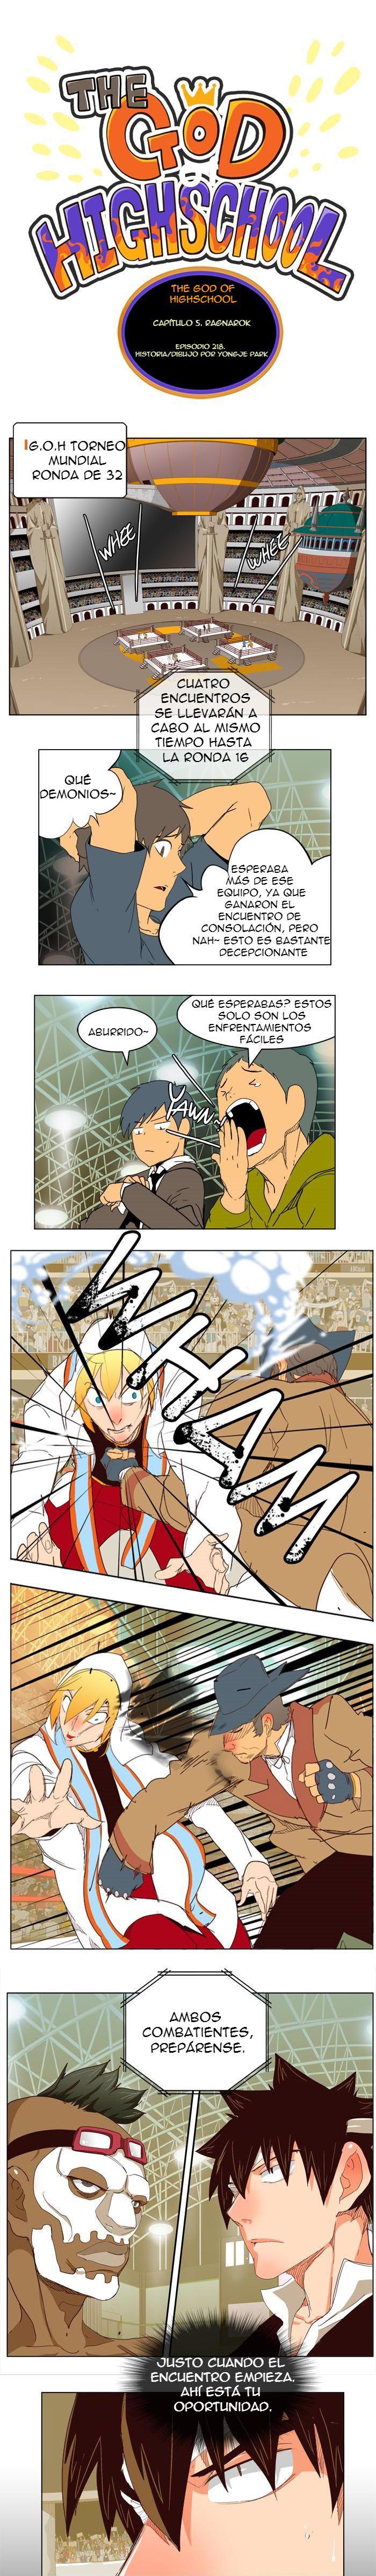 http://c5.ninemanga.com/es_manga/37/485/454637/f338012f9f1b6f6b2cfbb8f9179c8744.jpg Page 1